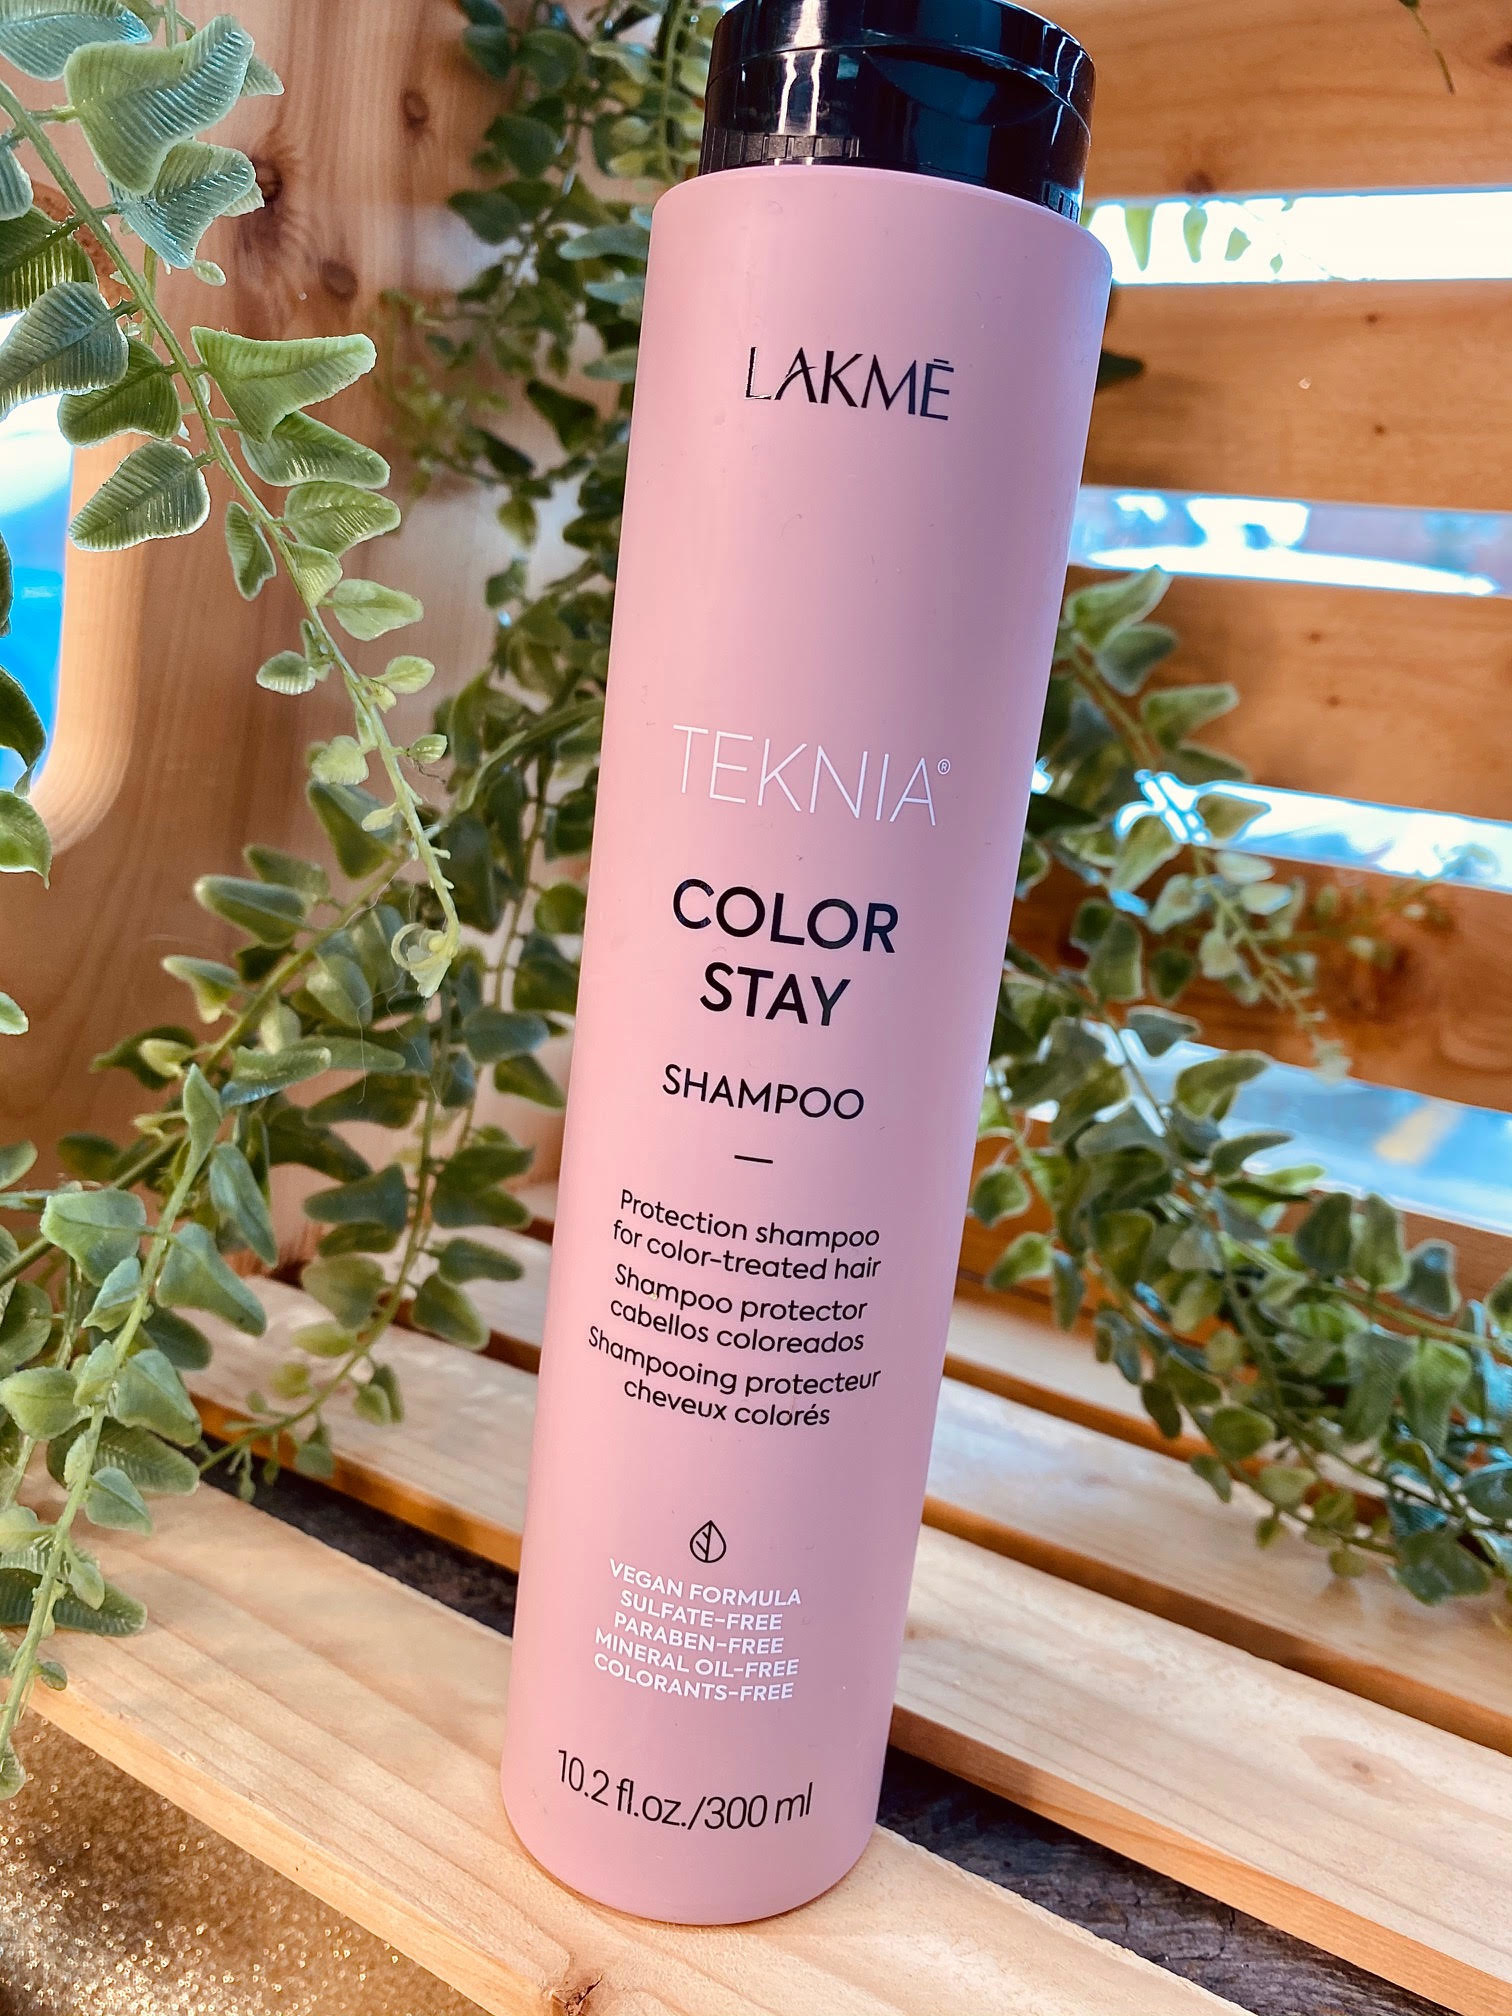 Lakmé TEKNIA color stay shampooing 300ml